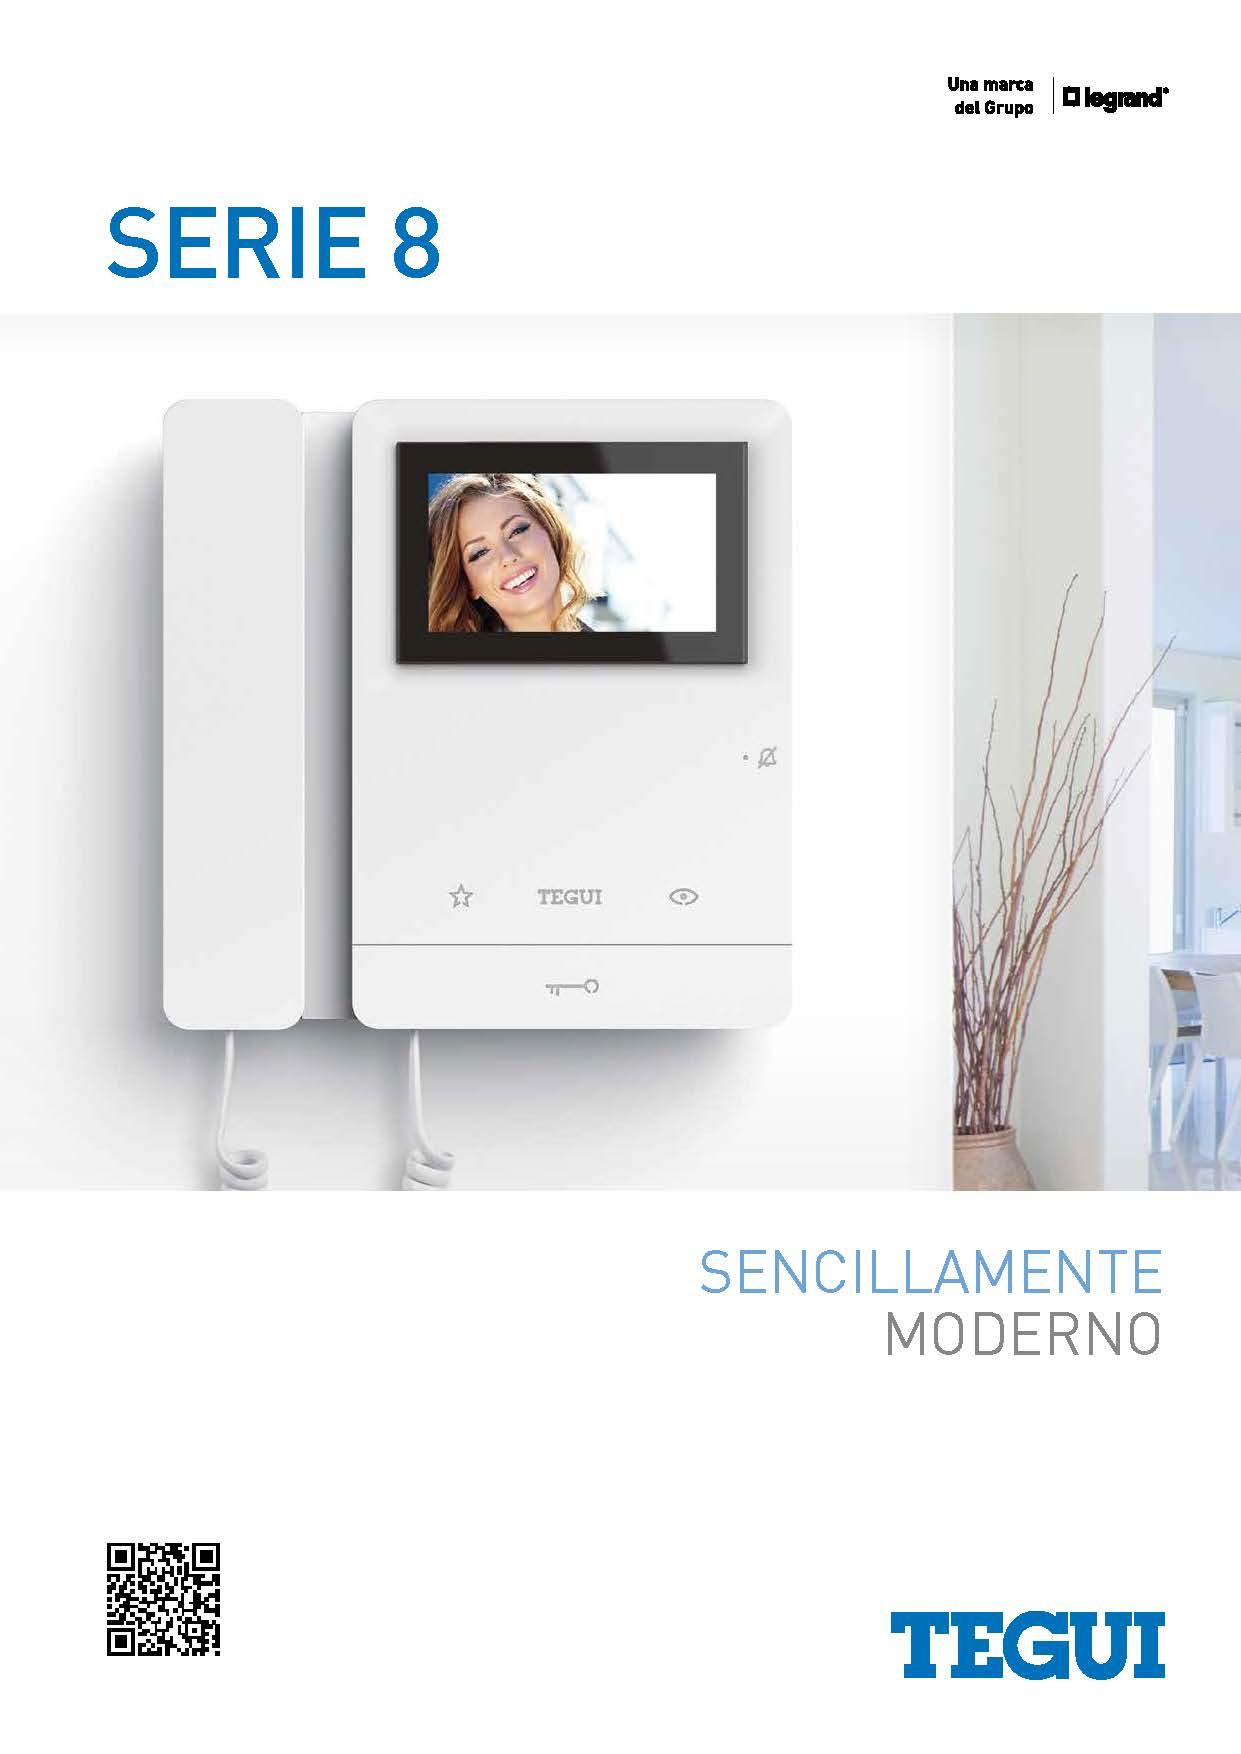 Características Técnicas - FICHA TECNICA monitor y telefonillo Serie 8 Tegui